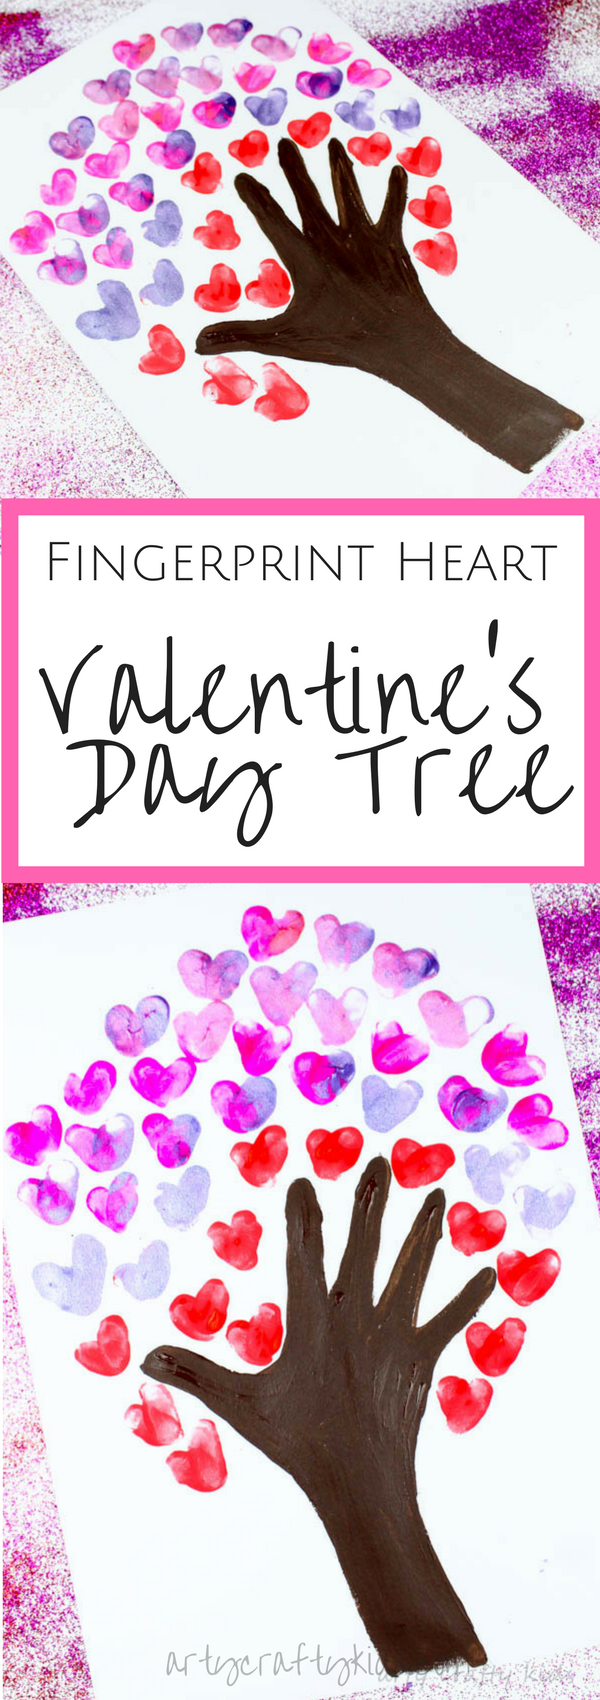 Fingerprint Heart Valentines Day Tree   Arty Crafty Kids